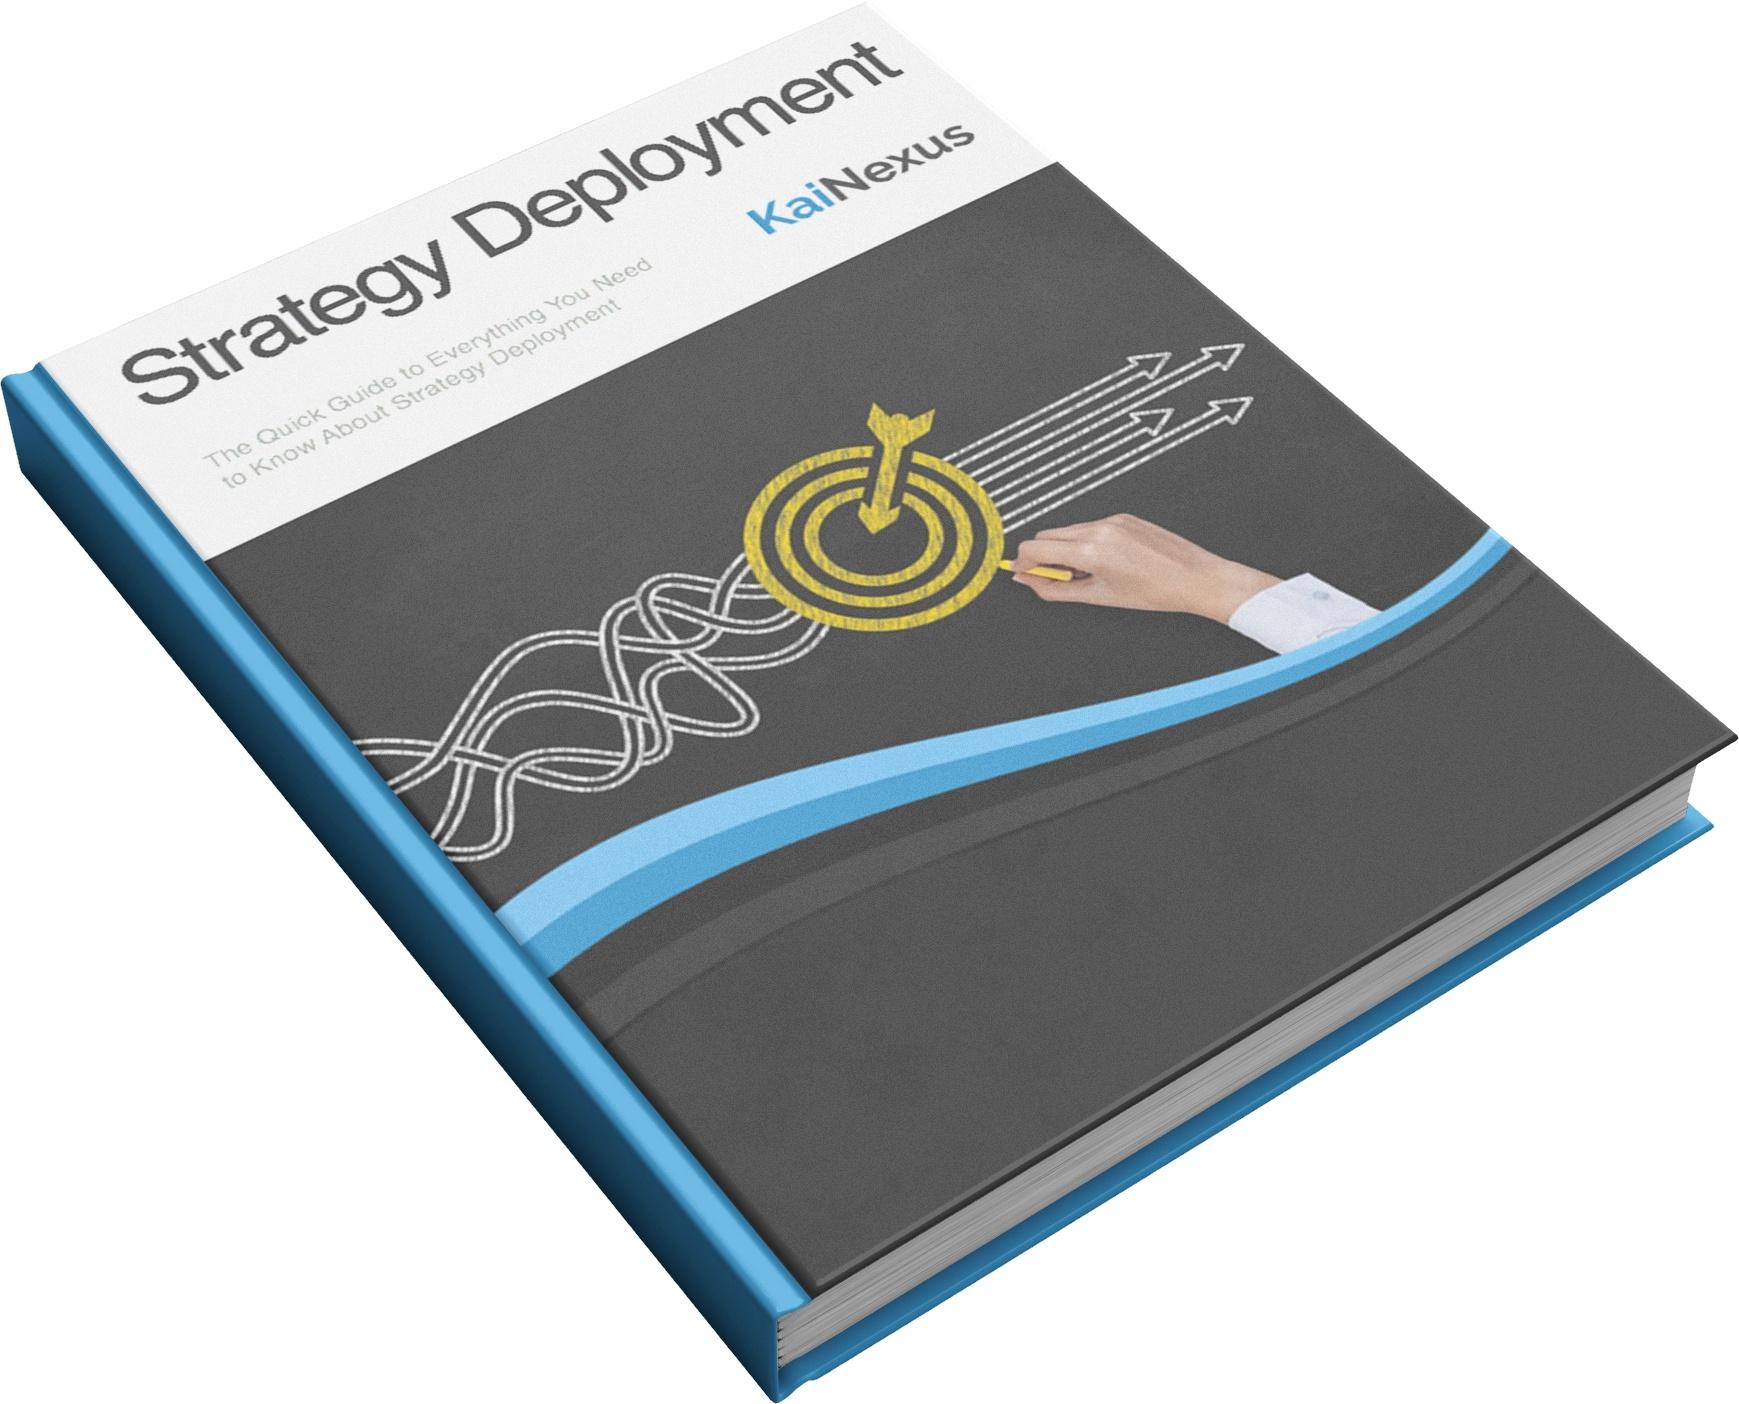 Strategy Deployment eBook Cover.jpg